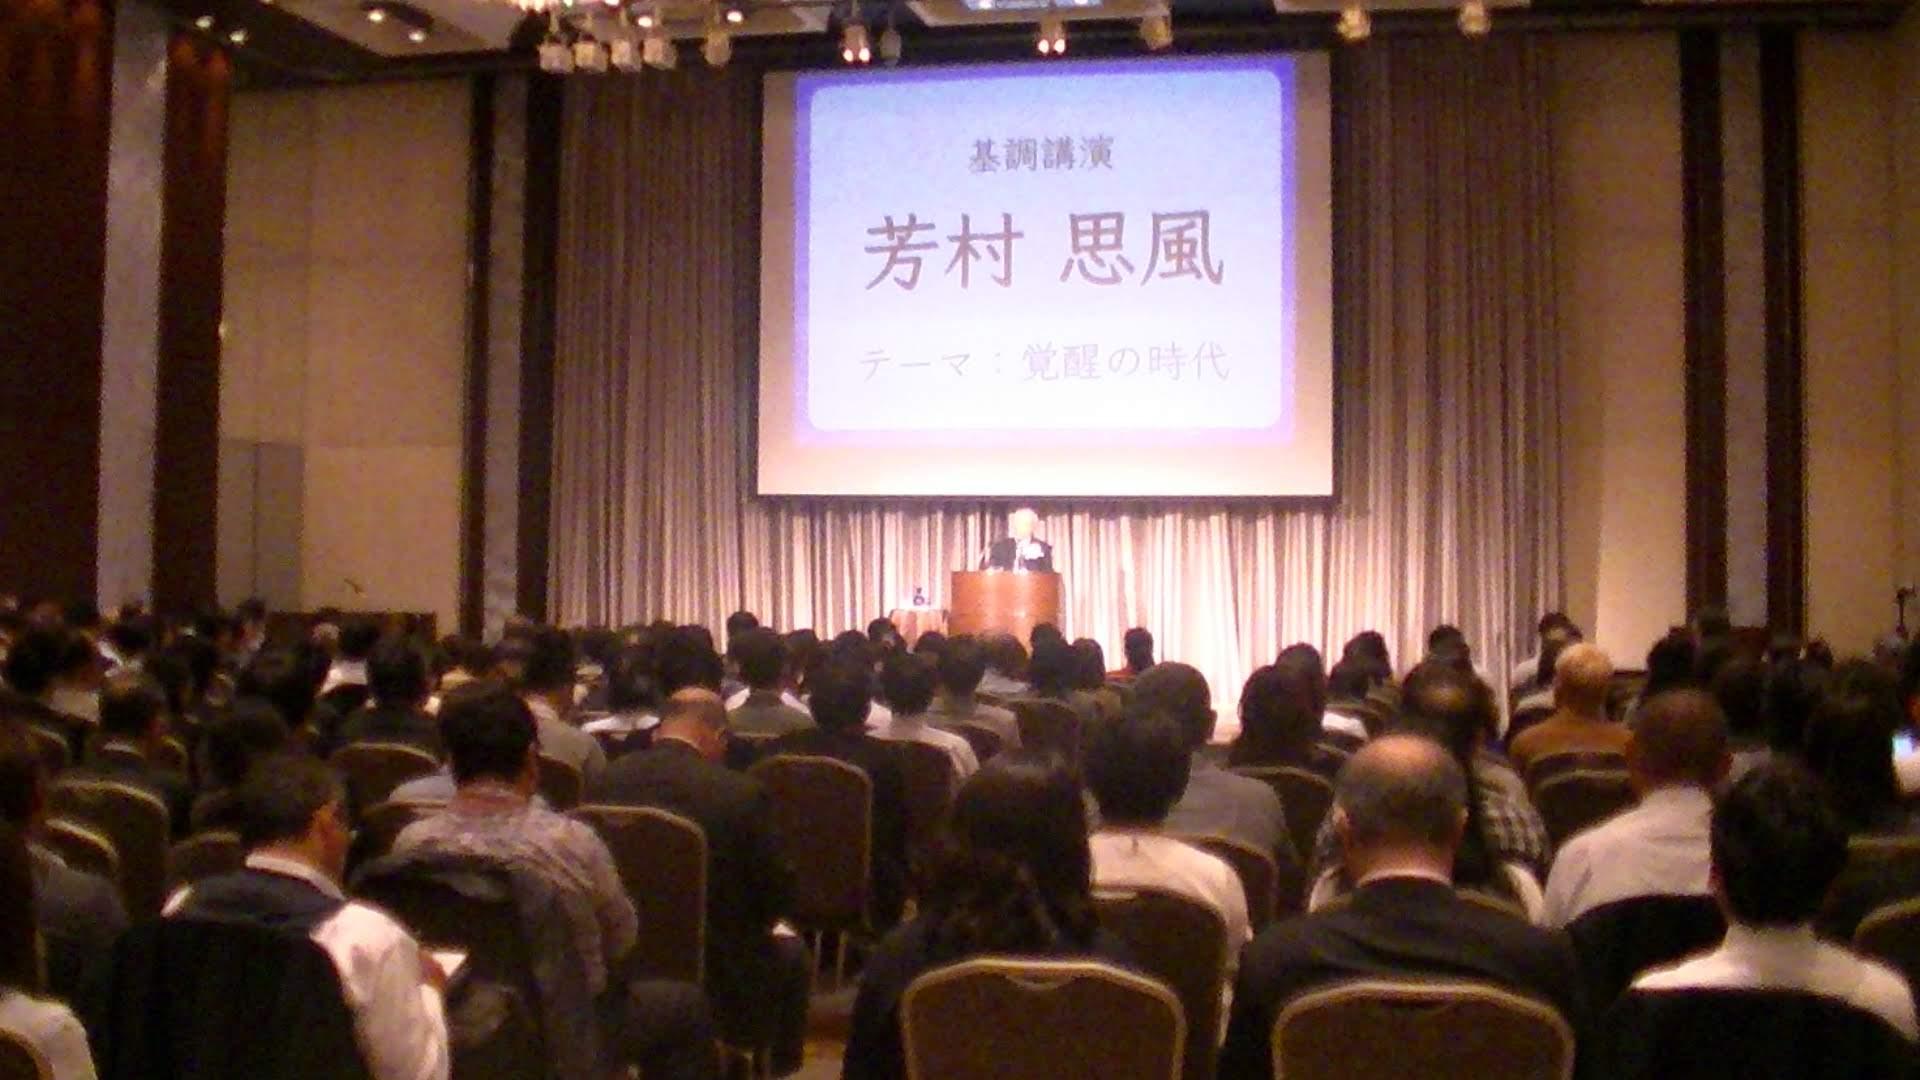 PIC 1708 1 - 思風会全国大会in広島